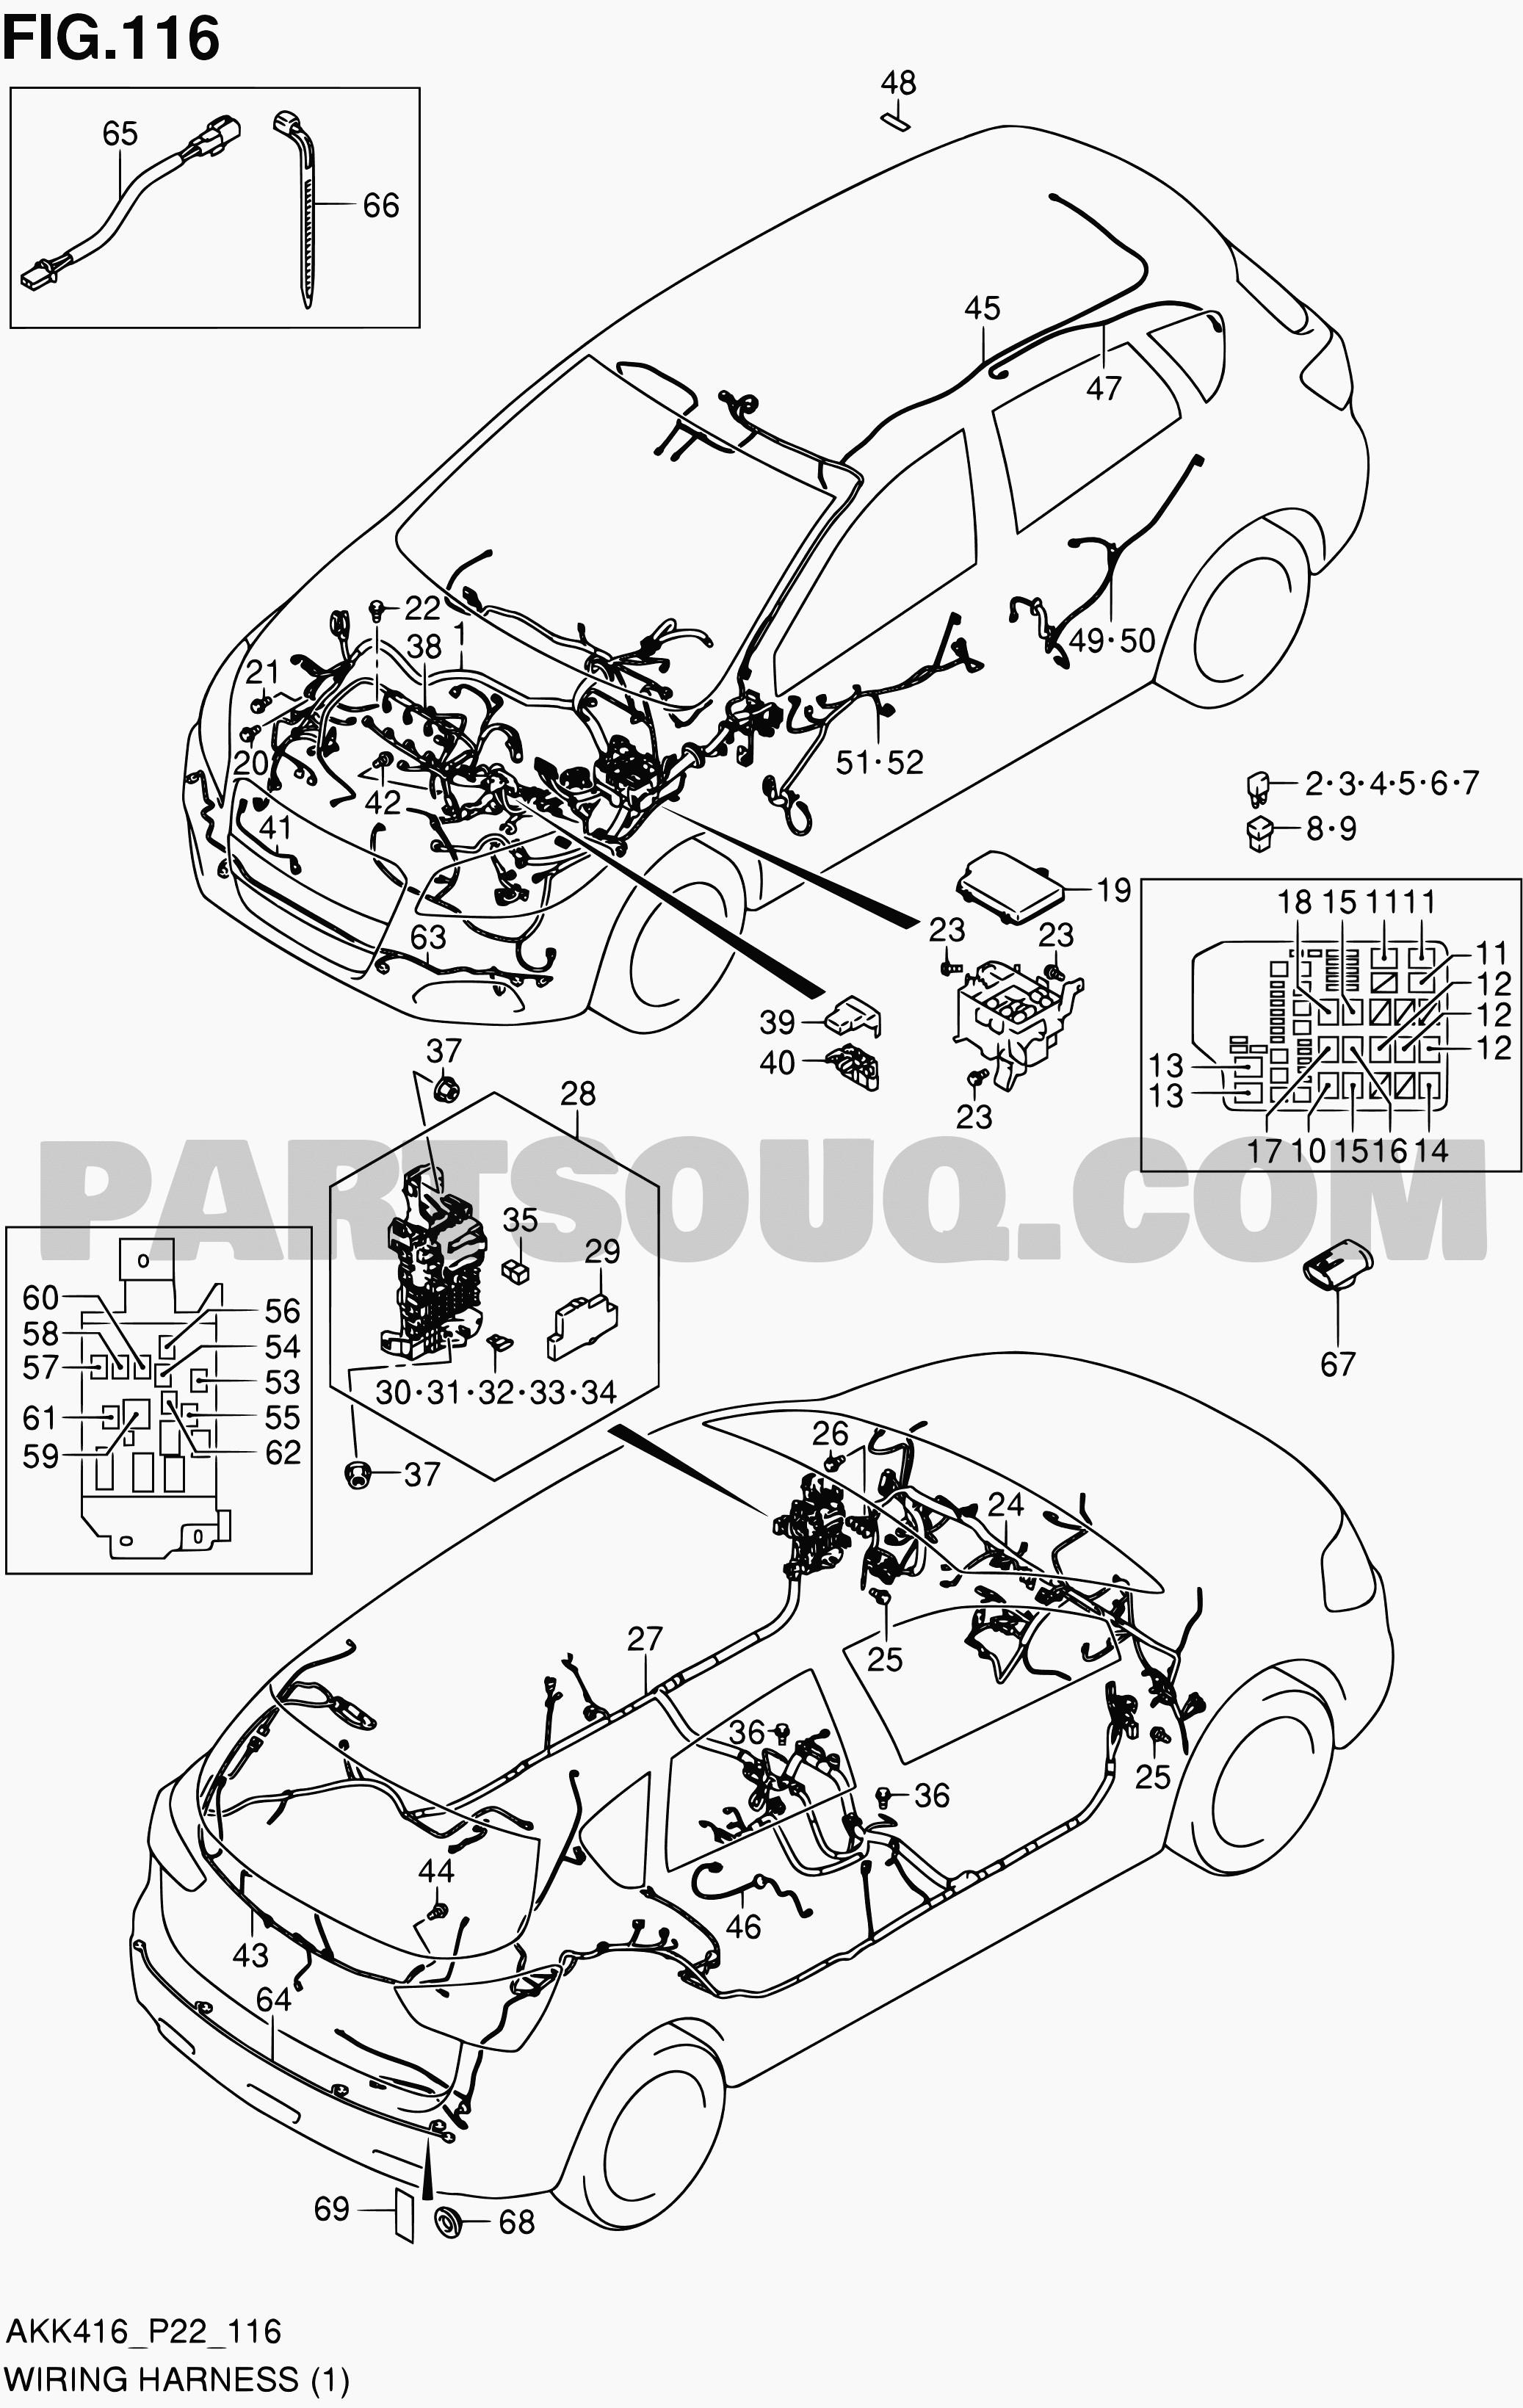 Car Undercarriage Parts Diagram Exterior Car Parts Diagram 116 Wiring Harness M16a Lhd Sx4 M16a Of Car Undercarriage Parts Diagram